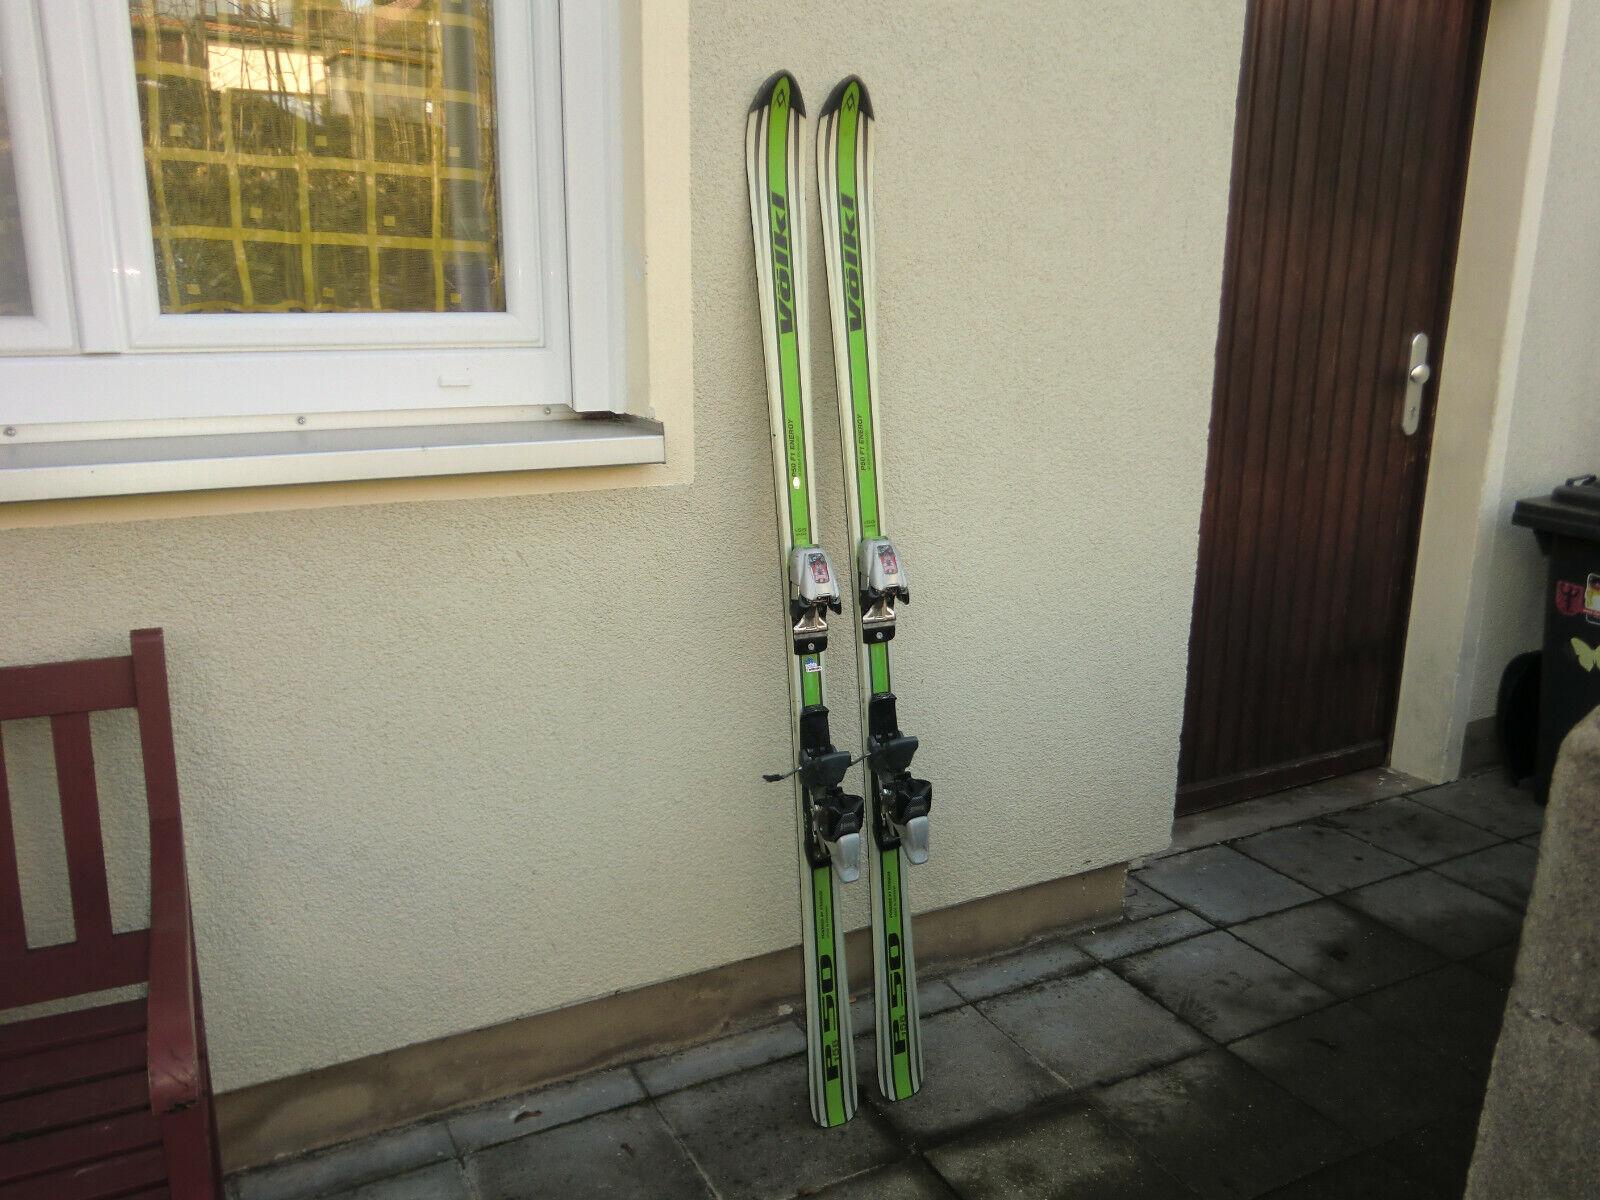 Ski Alpinski Carvingski Carverski VÖLKI  P 50 F1 ENERGY  , 158 cm, mit BINDUNG